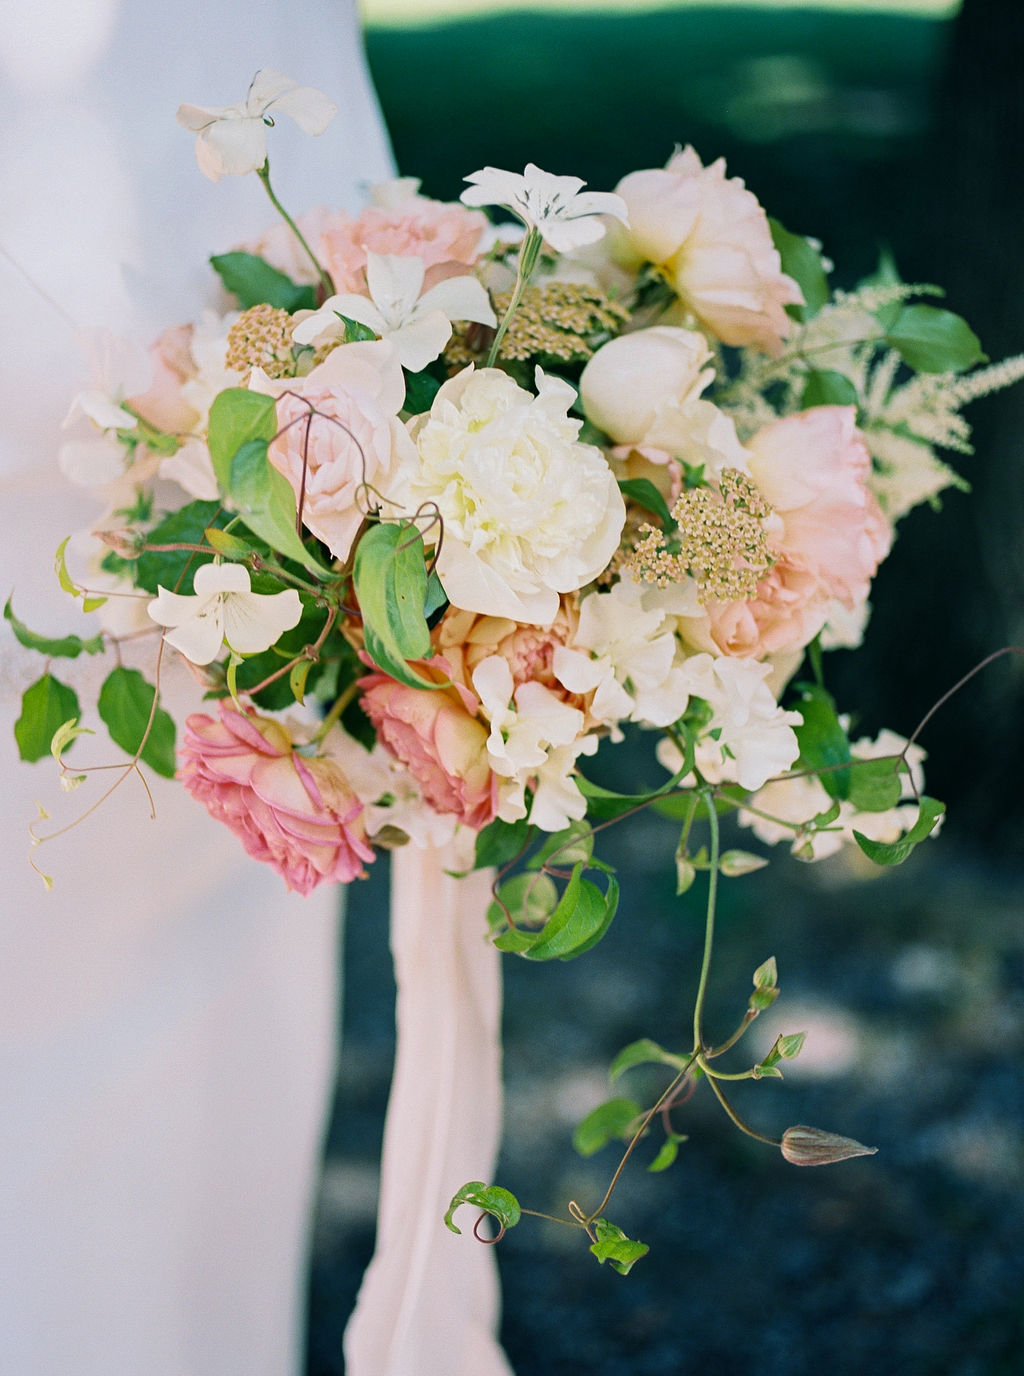 Alexandra-Elise-Photography-Film-Wedding-Photographer-Sonnenberg-Gardens-Finger-Lakes-Canandaigua-Bride-Groom-027.jpg